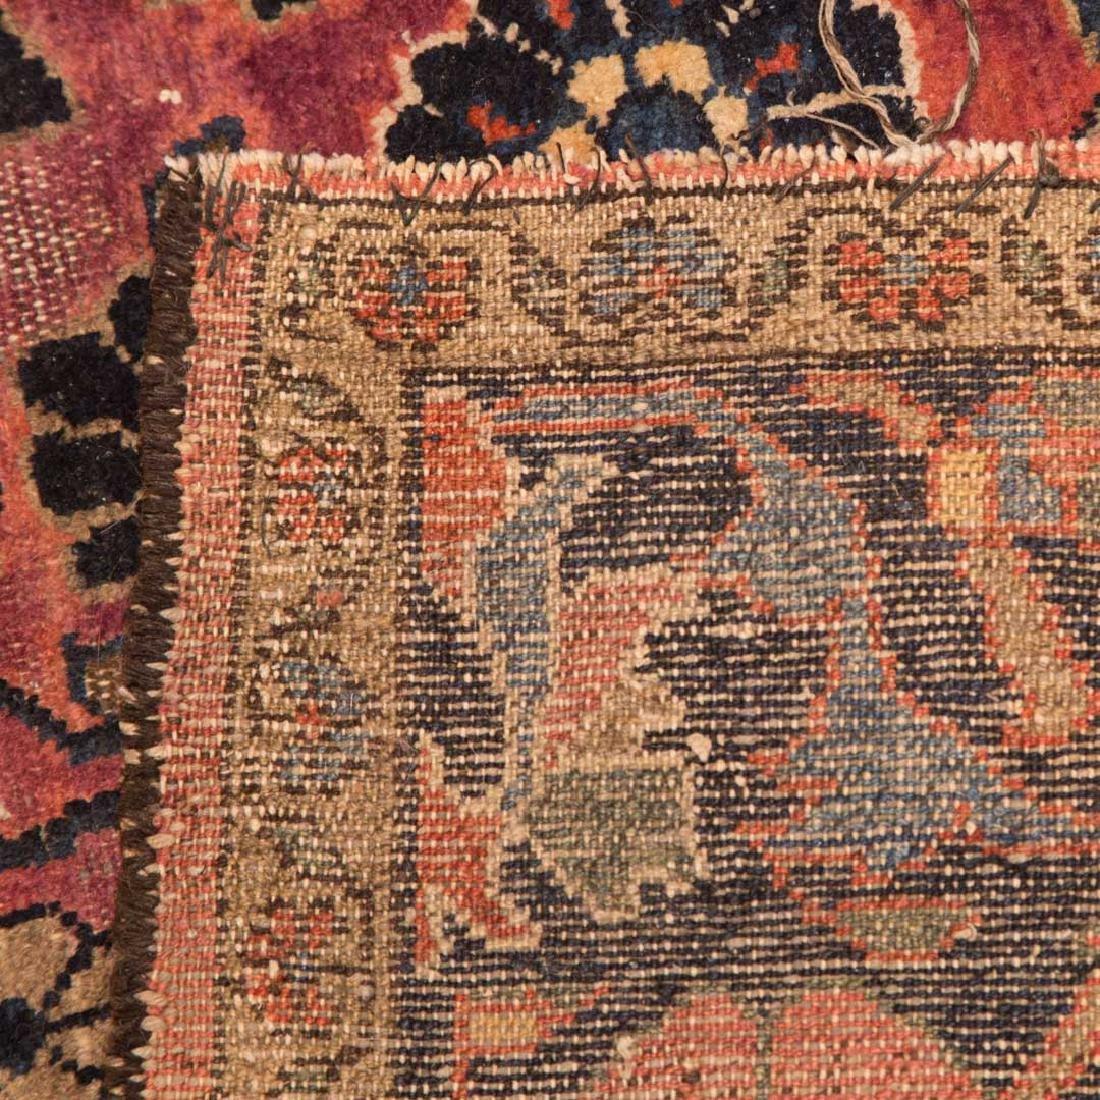 Antique Lilehan rug, approx. 5.5 x 7.3 - 3